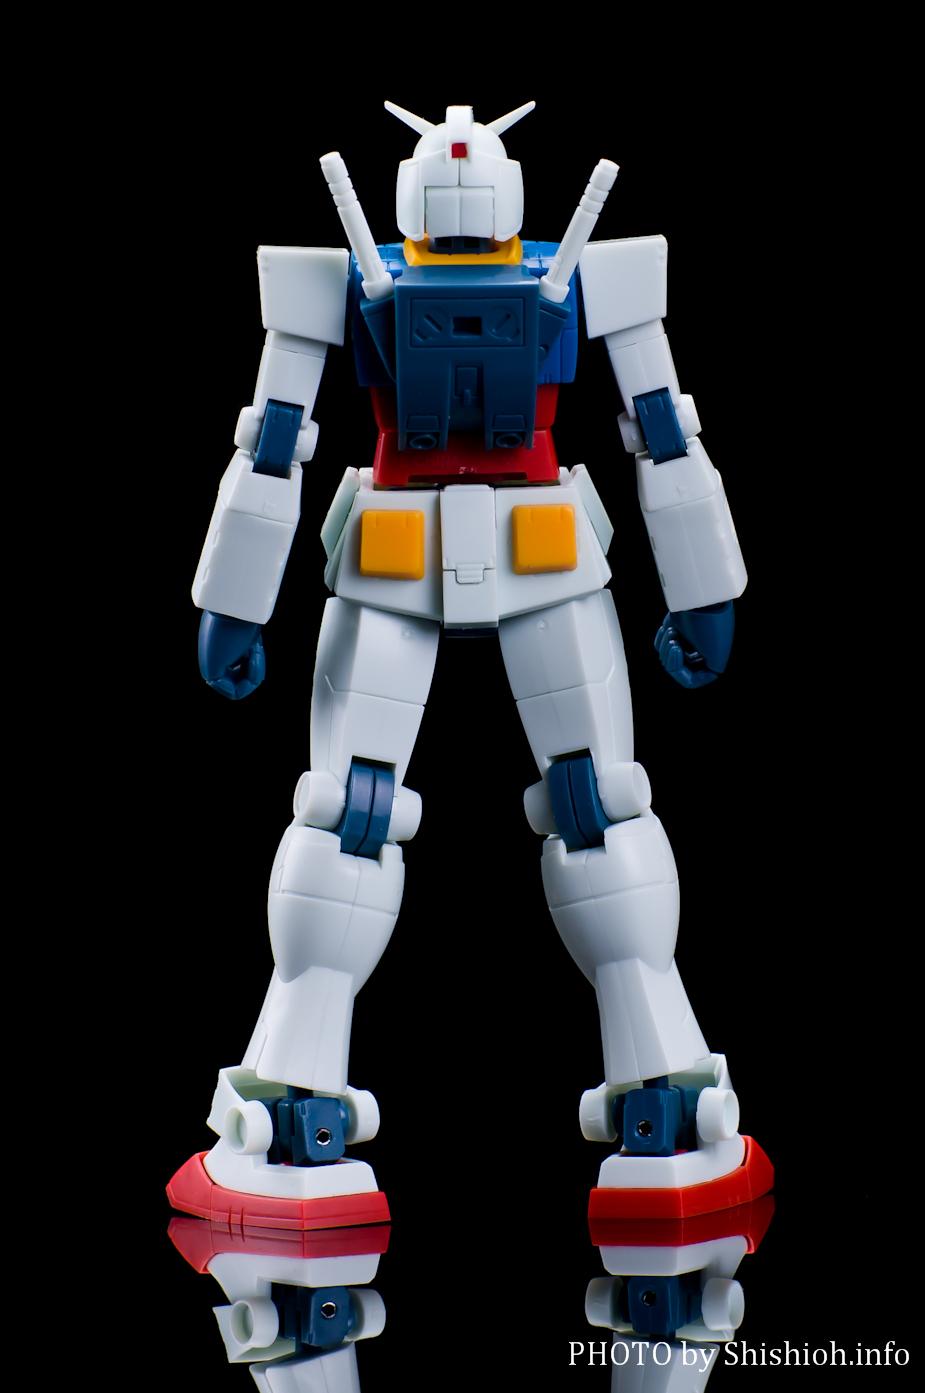 ROBOT魂 RX-78-2 ガンダム ver. A.N.I.M.E.